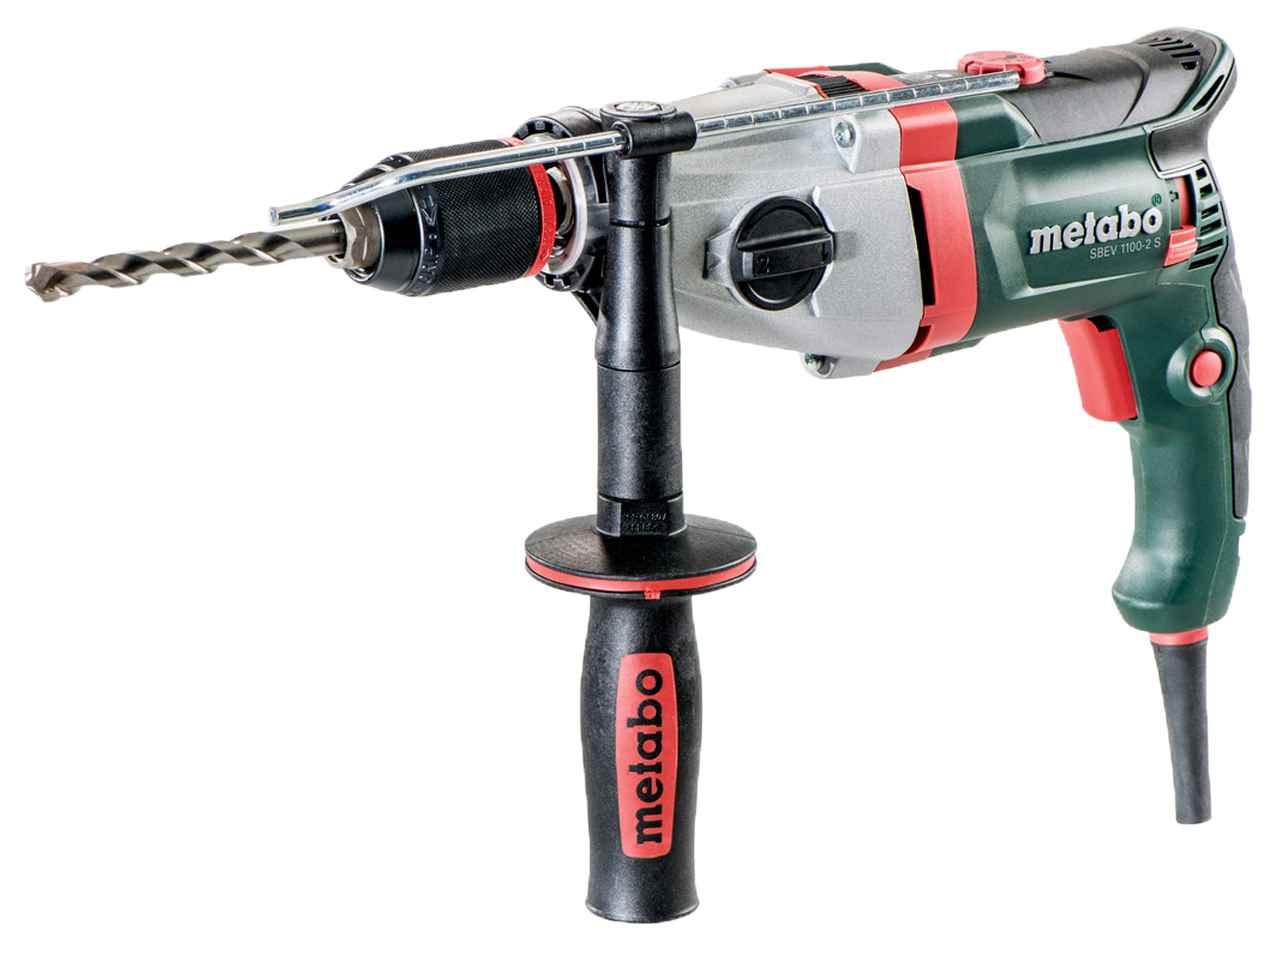 Metabo sbe760 240v 240v 760W impact drill